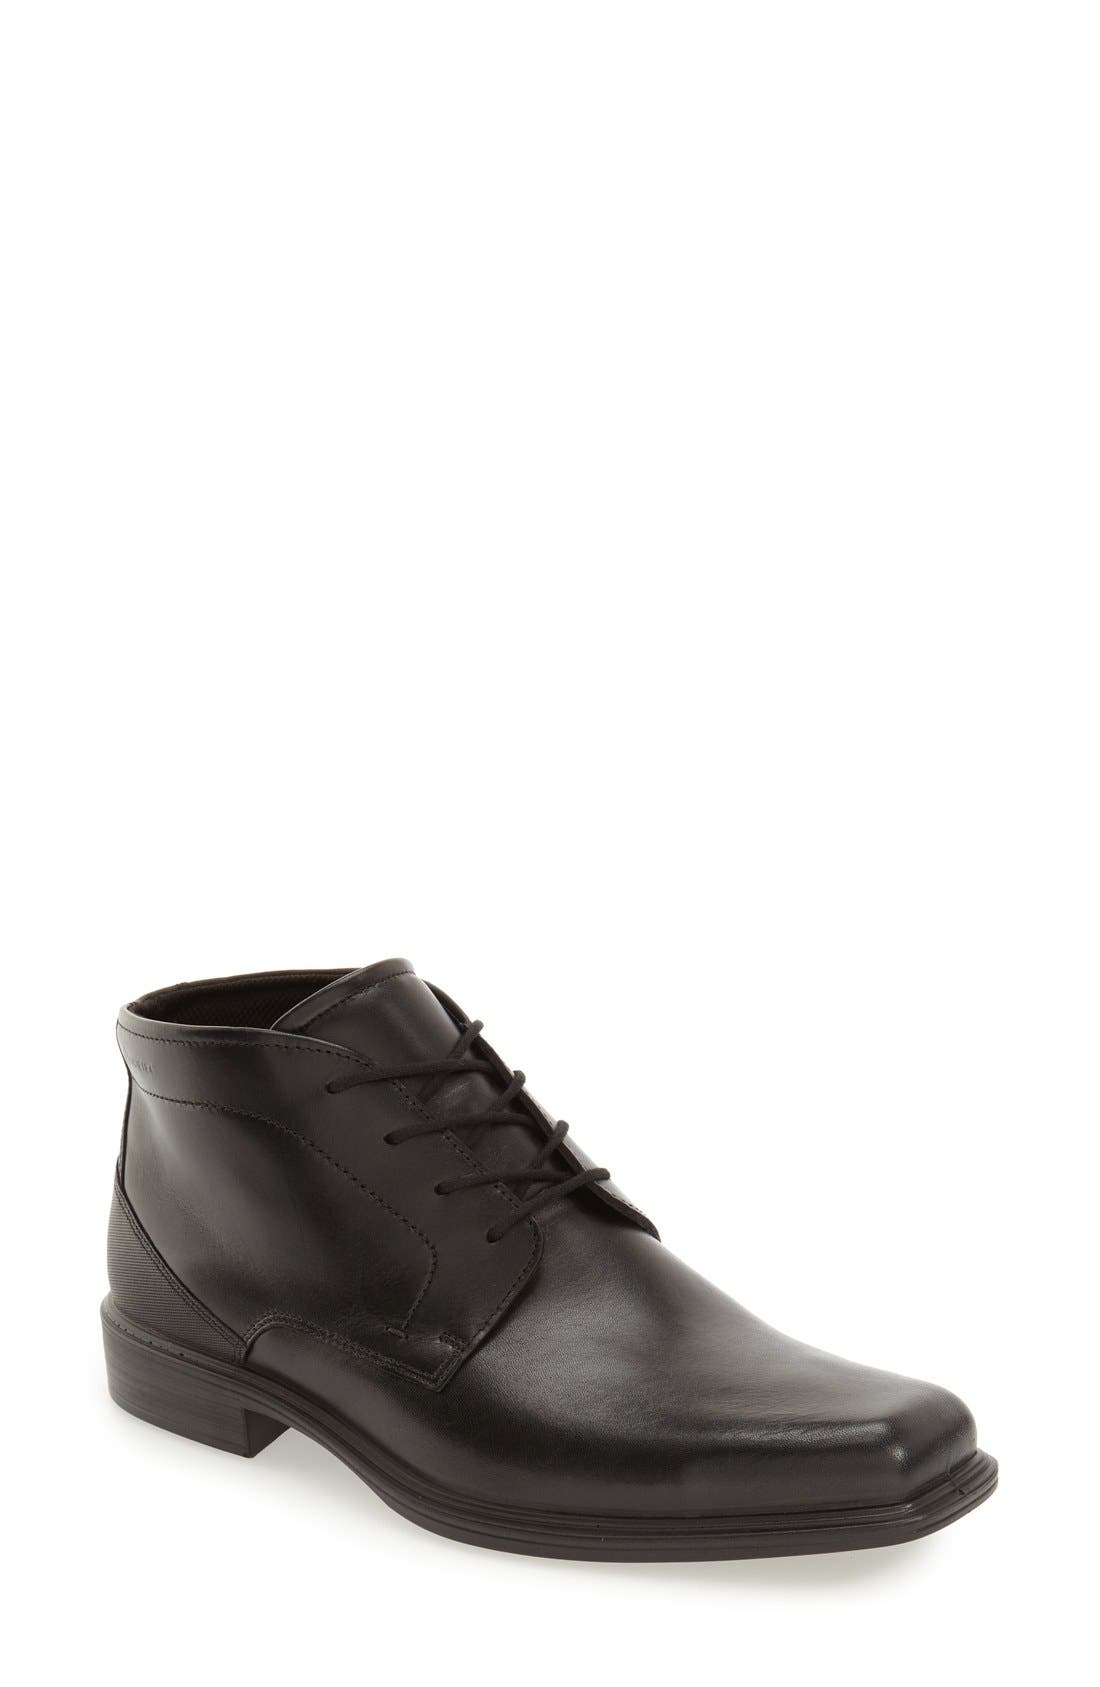 'Johannesburg GTX' Chukka Boot,                             Main thumbnail 1, color,                             009